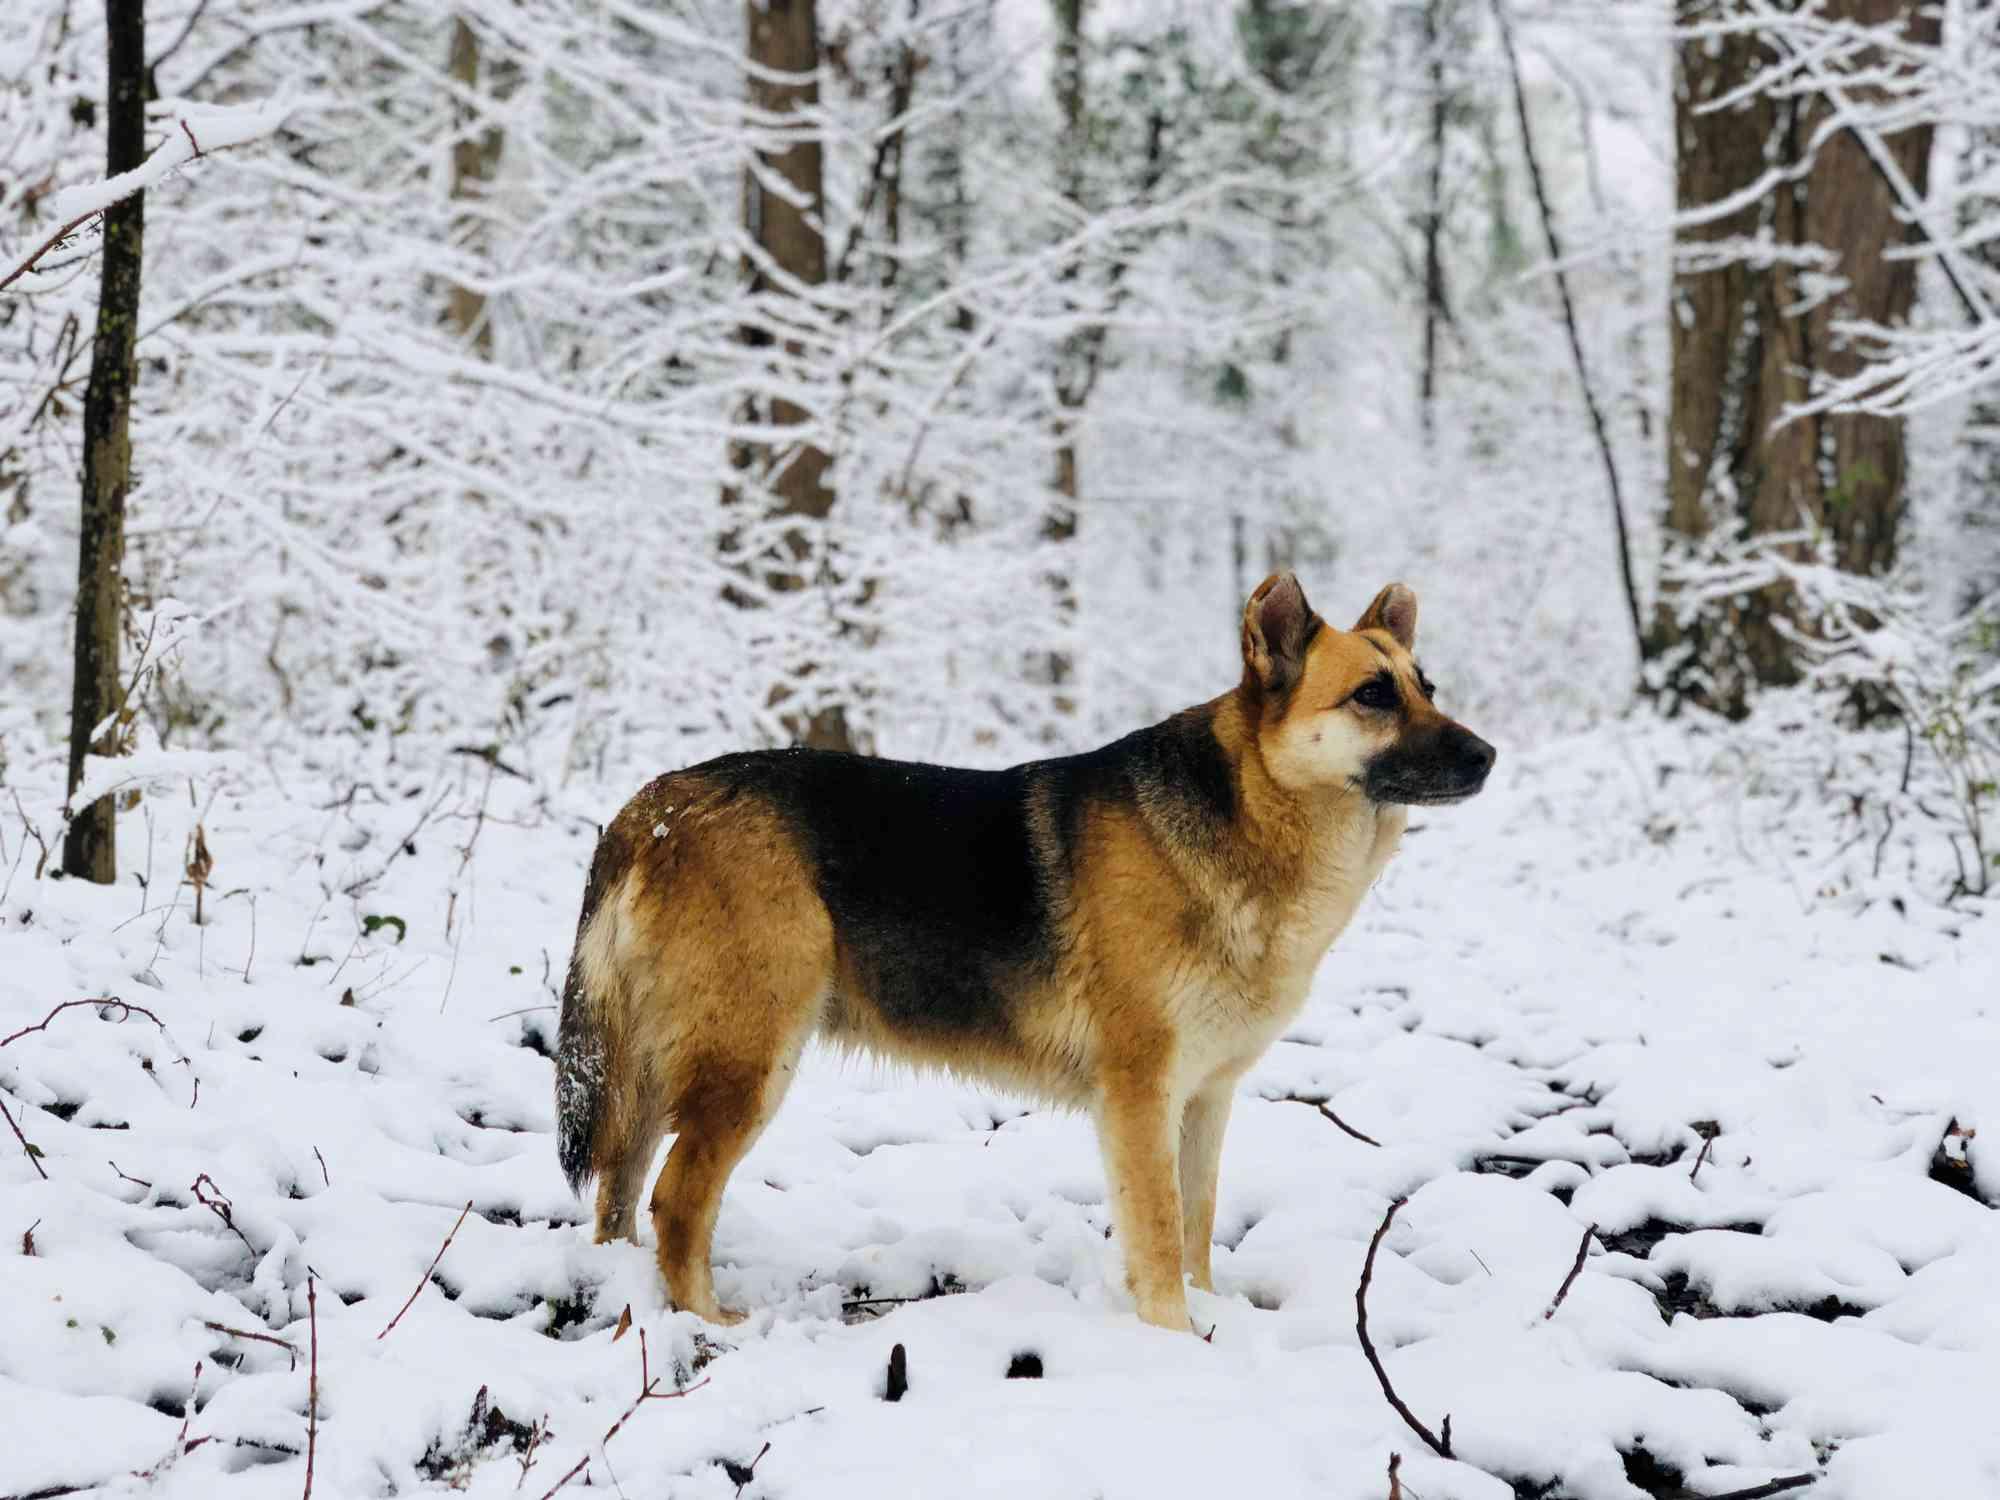 profile of german shepherd standing in snowy forest